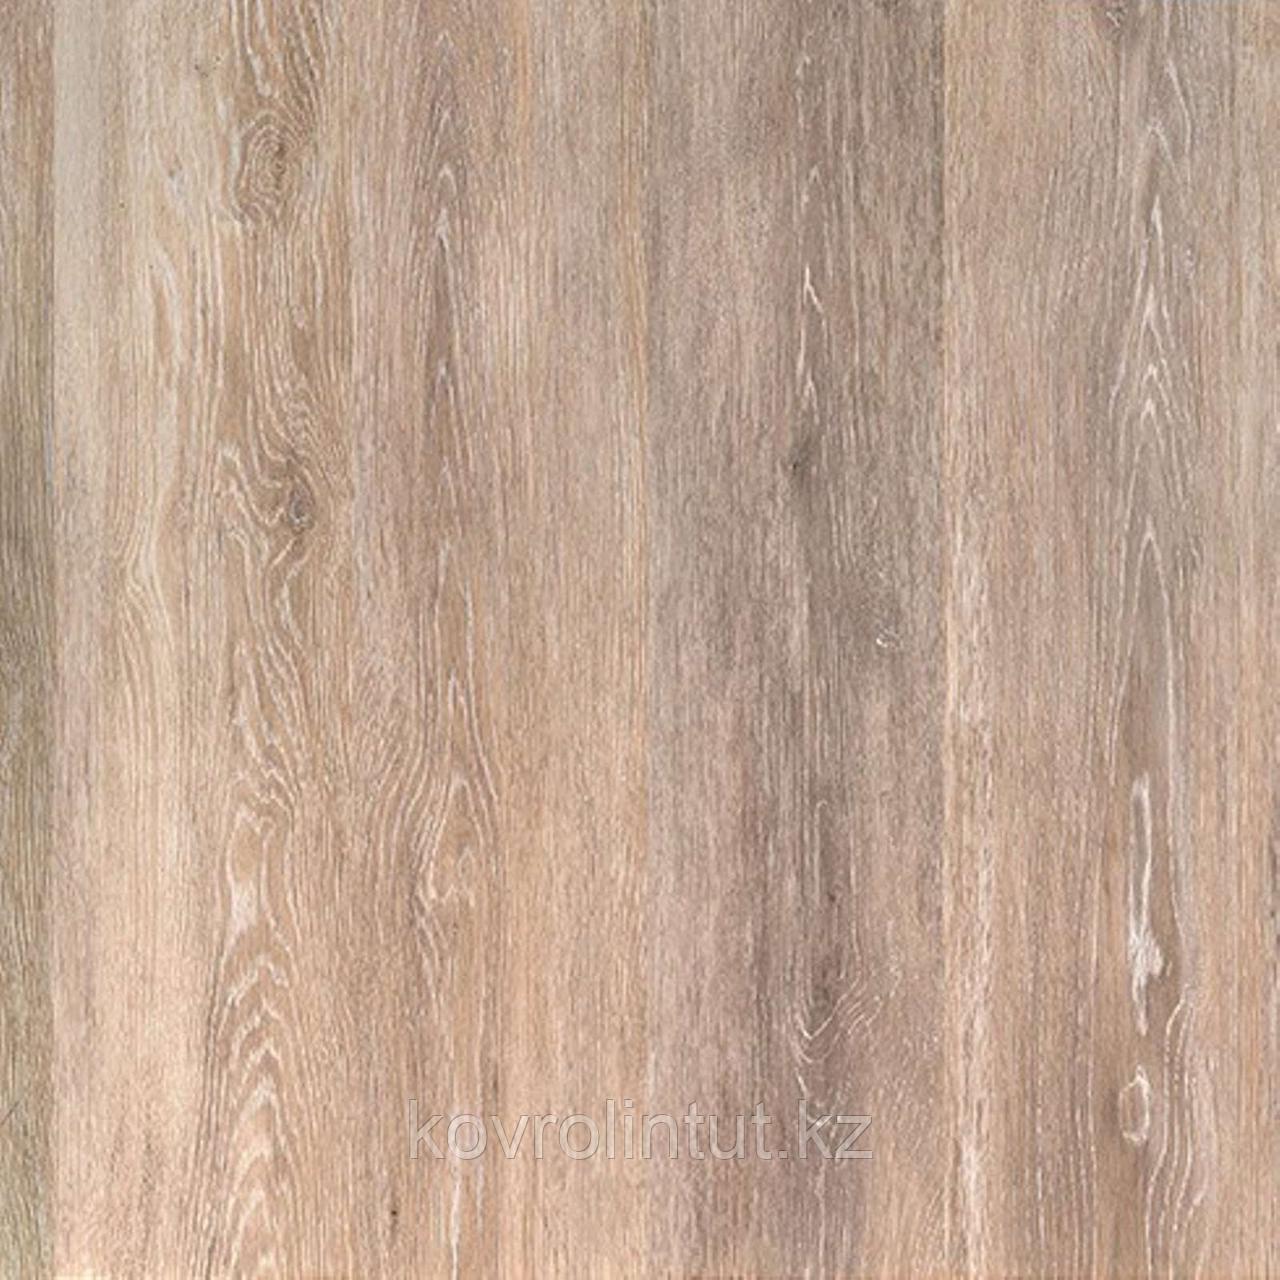 Плитка ПВХ клеевая Tarkett Art Vinyl New Age Ambient 230179015